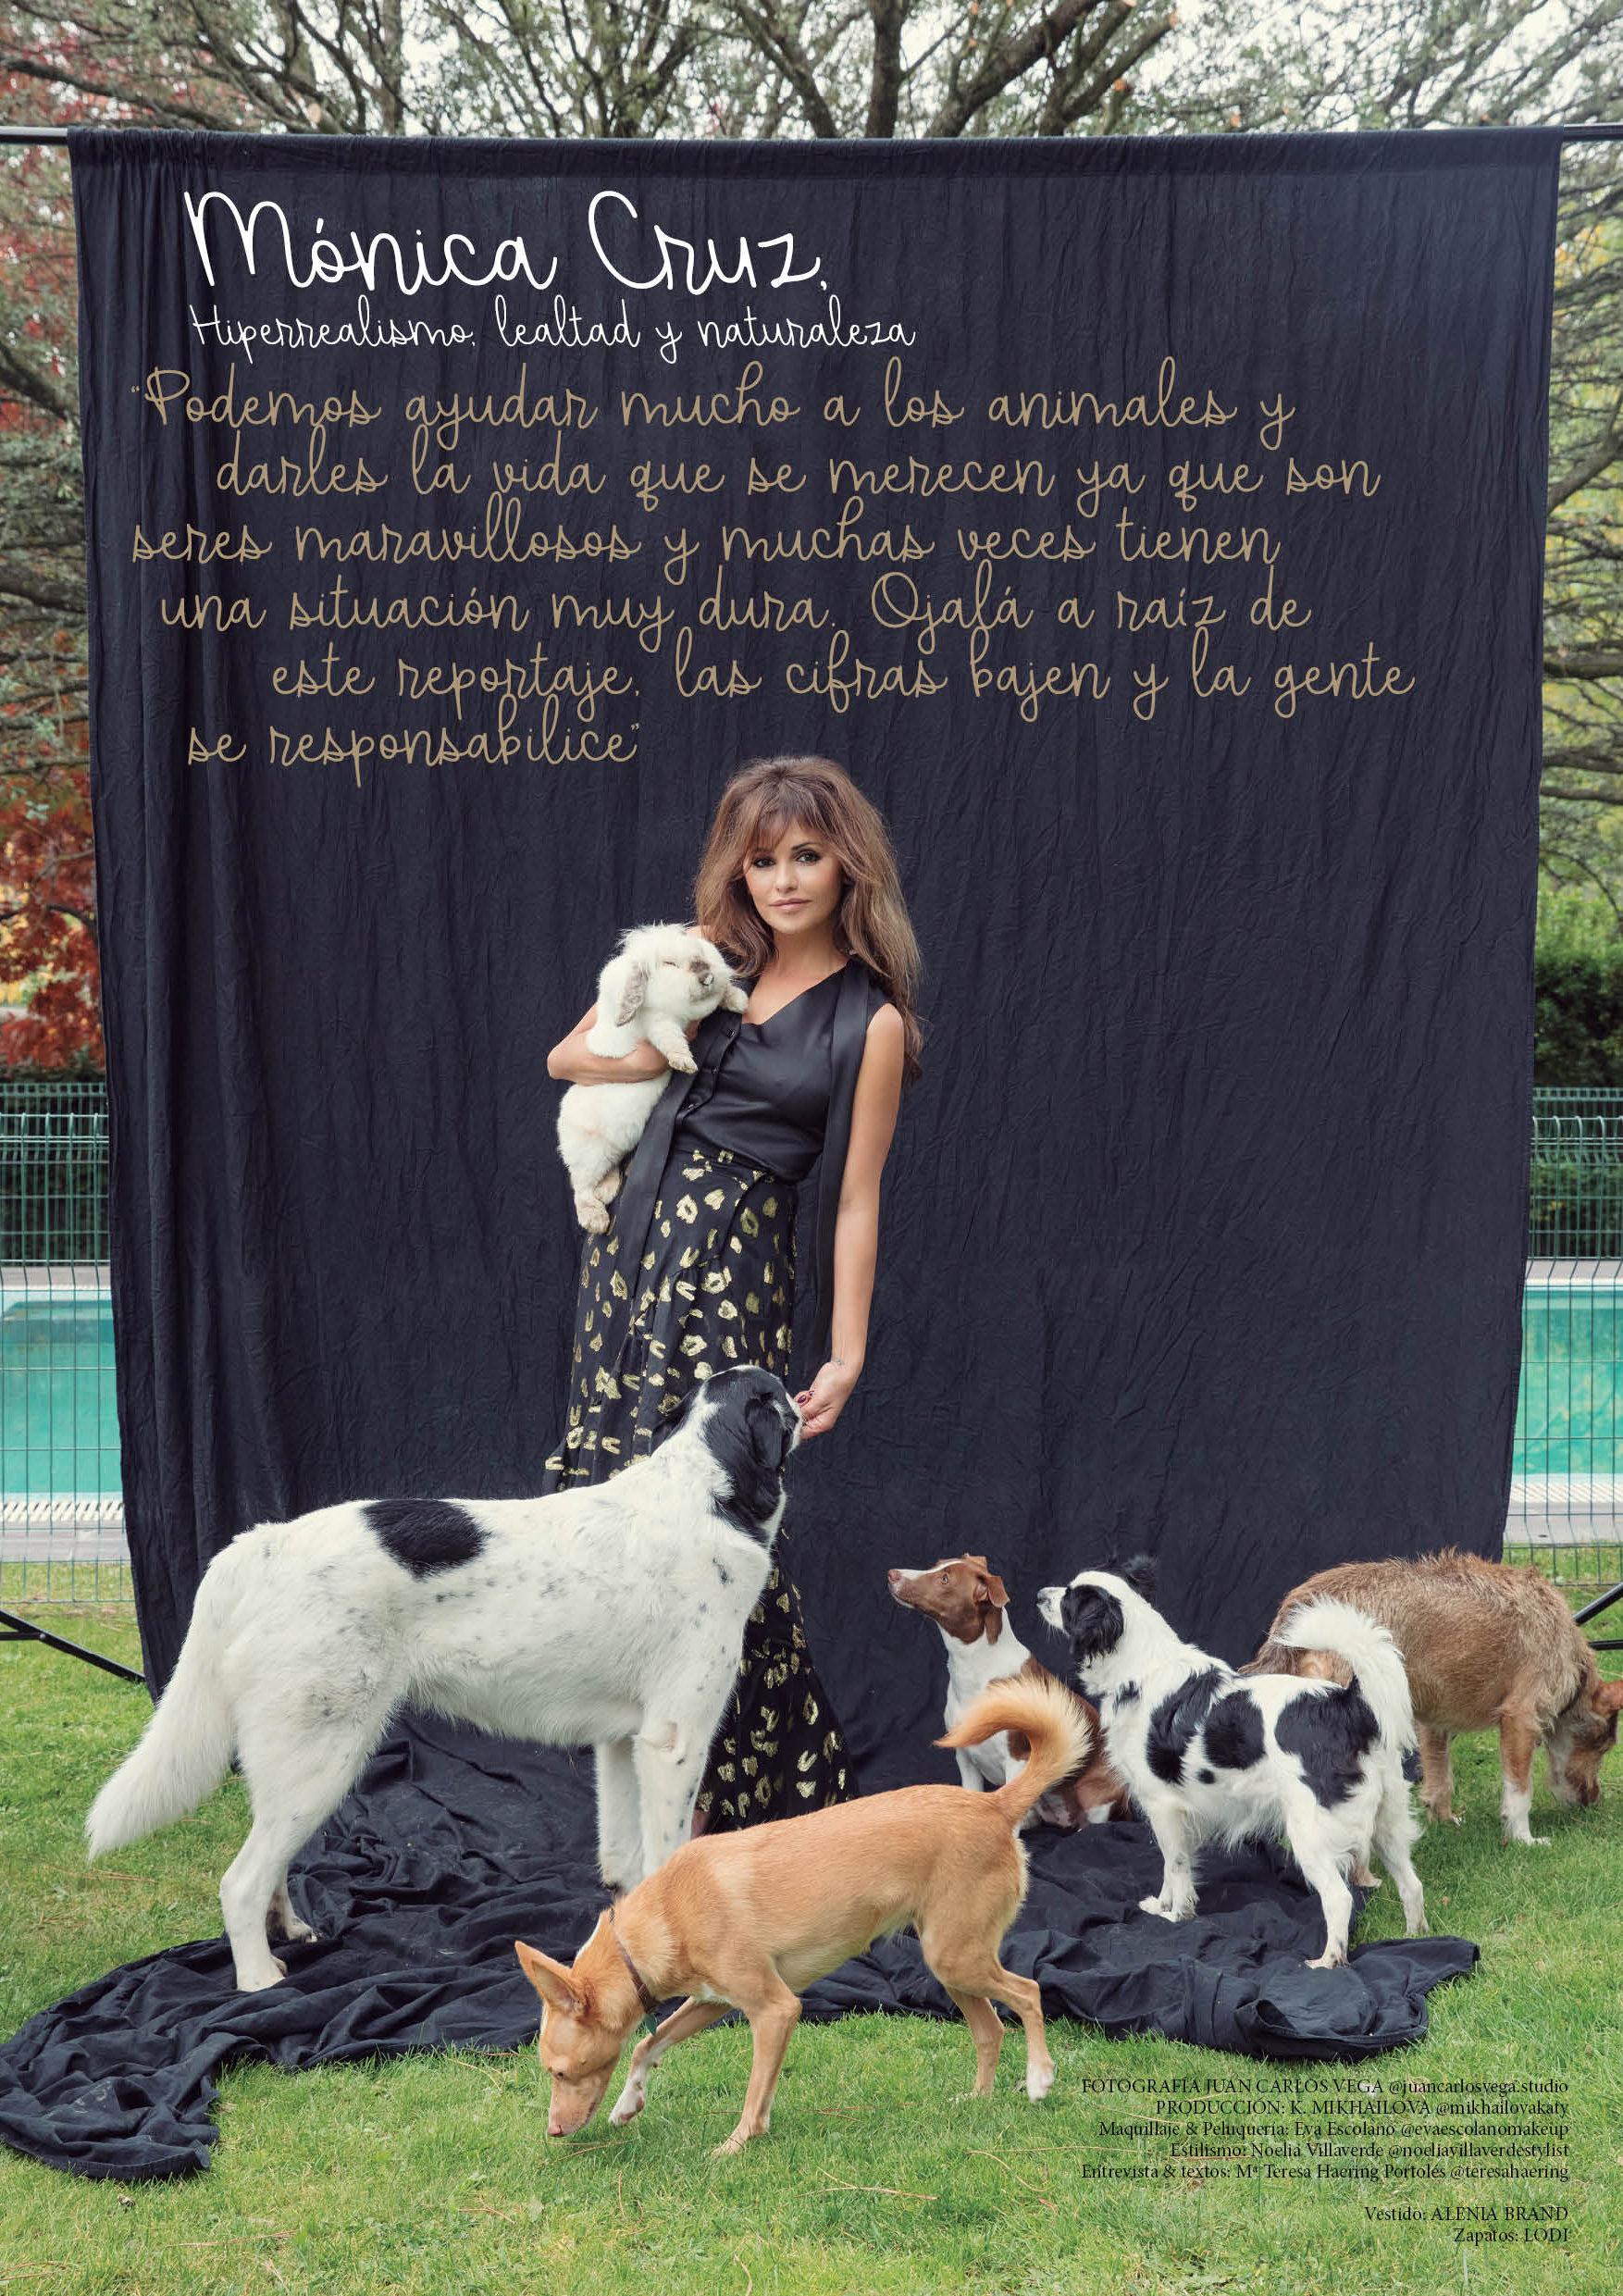 Mónica Cruz, Leales a los animales by VEGA